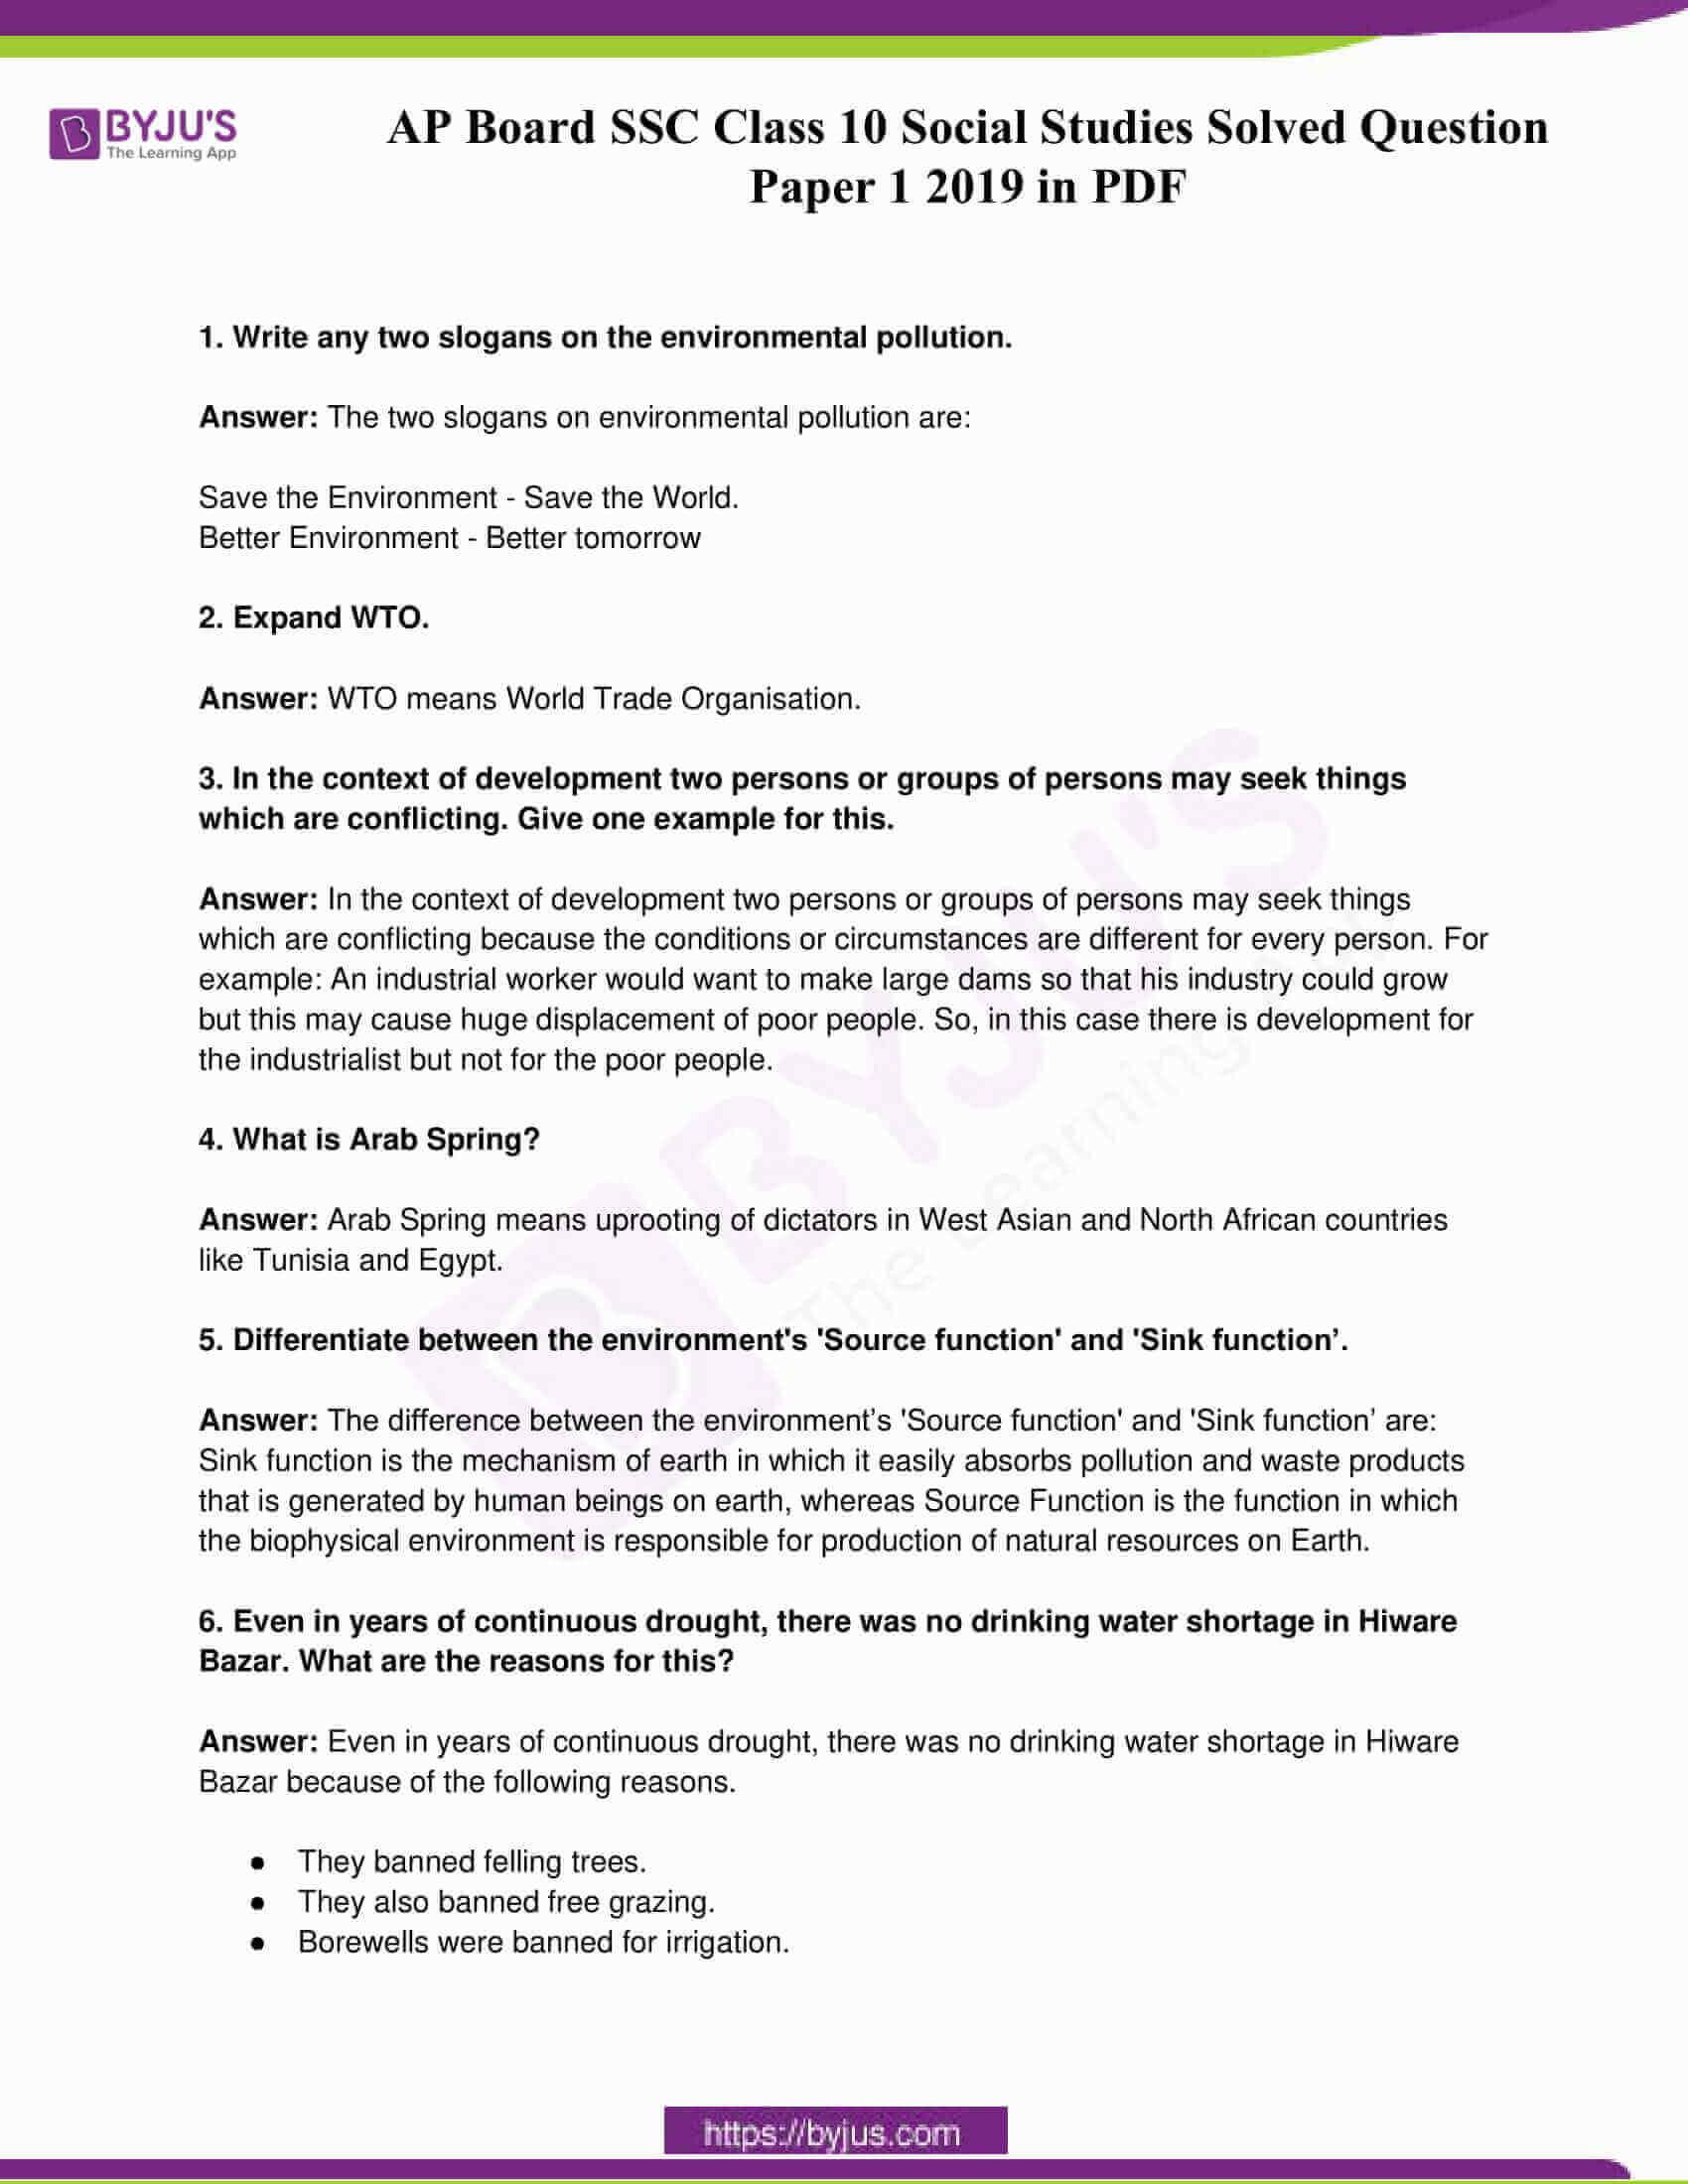 ap board ssc class 10 social studies solved question paper 1 2019 01